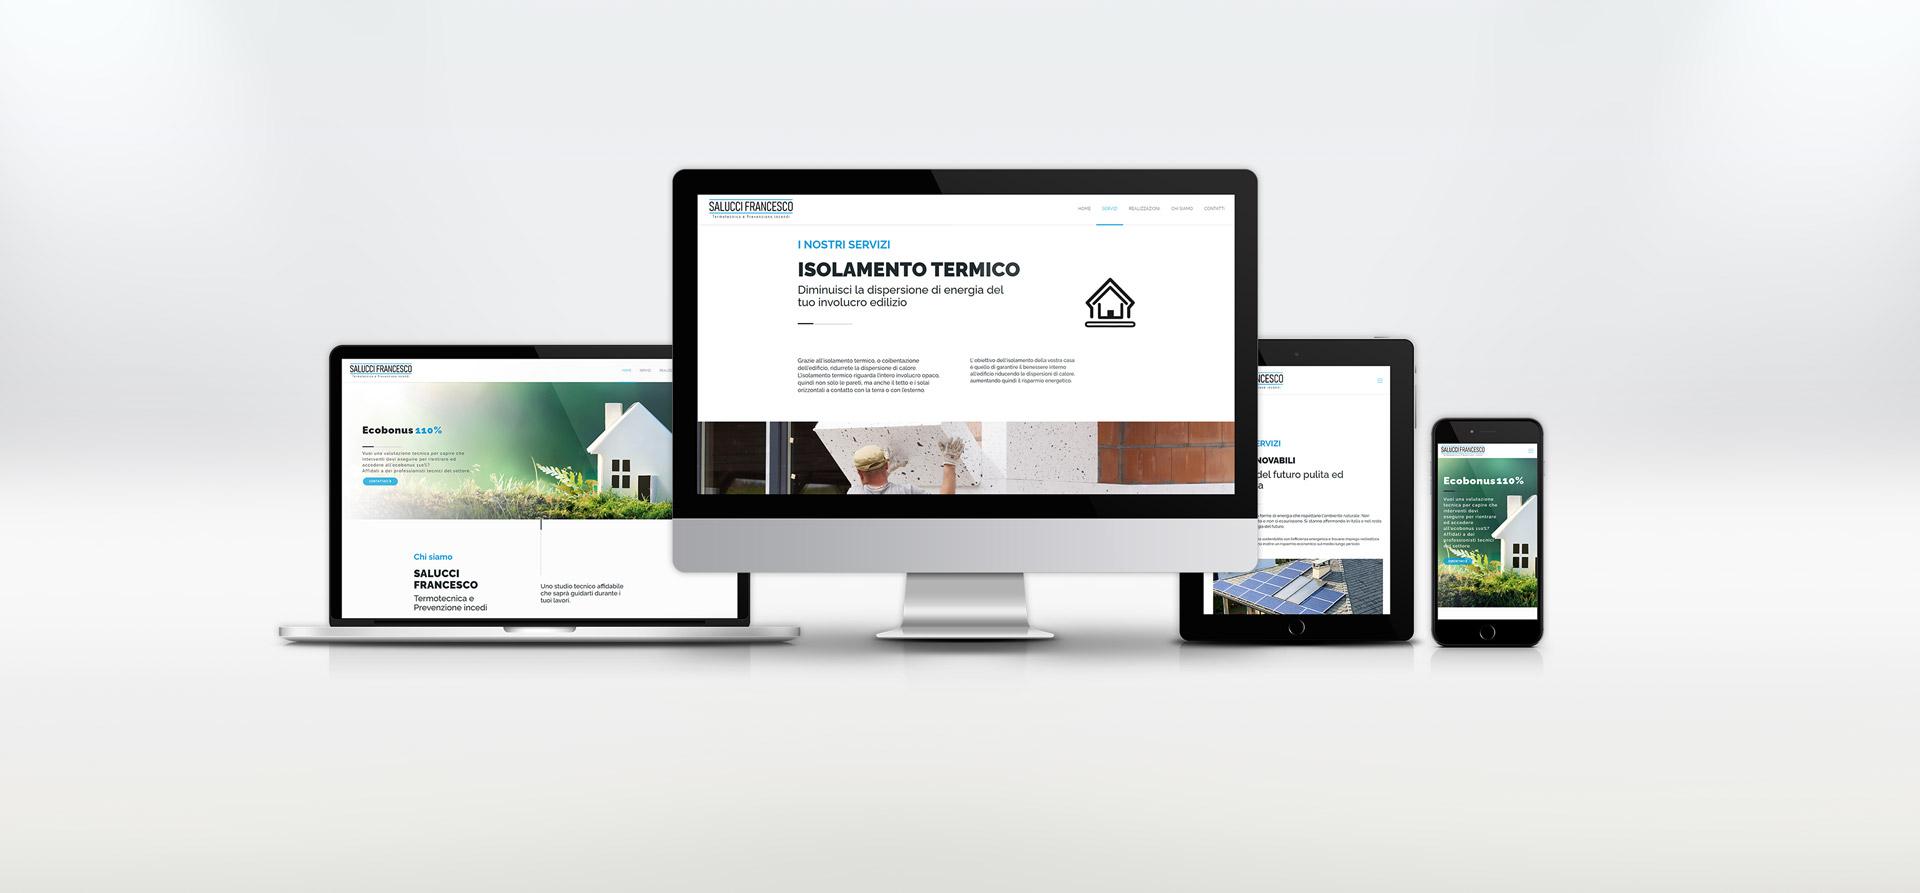 salucci-francesco-website-witrade-communication